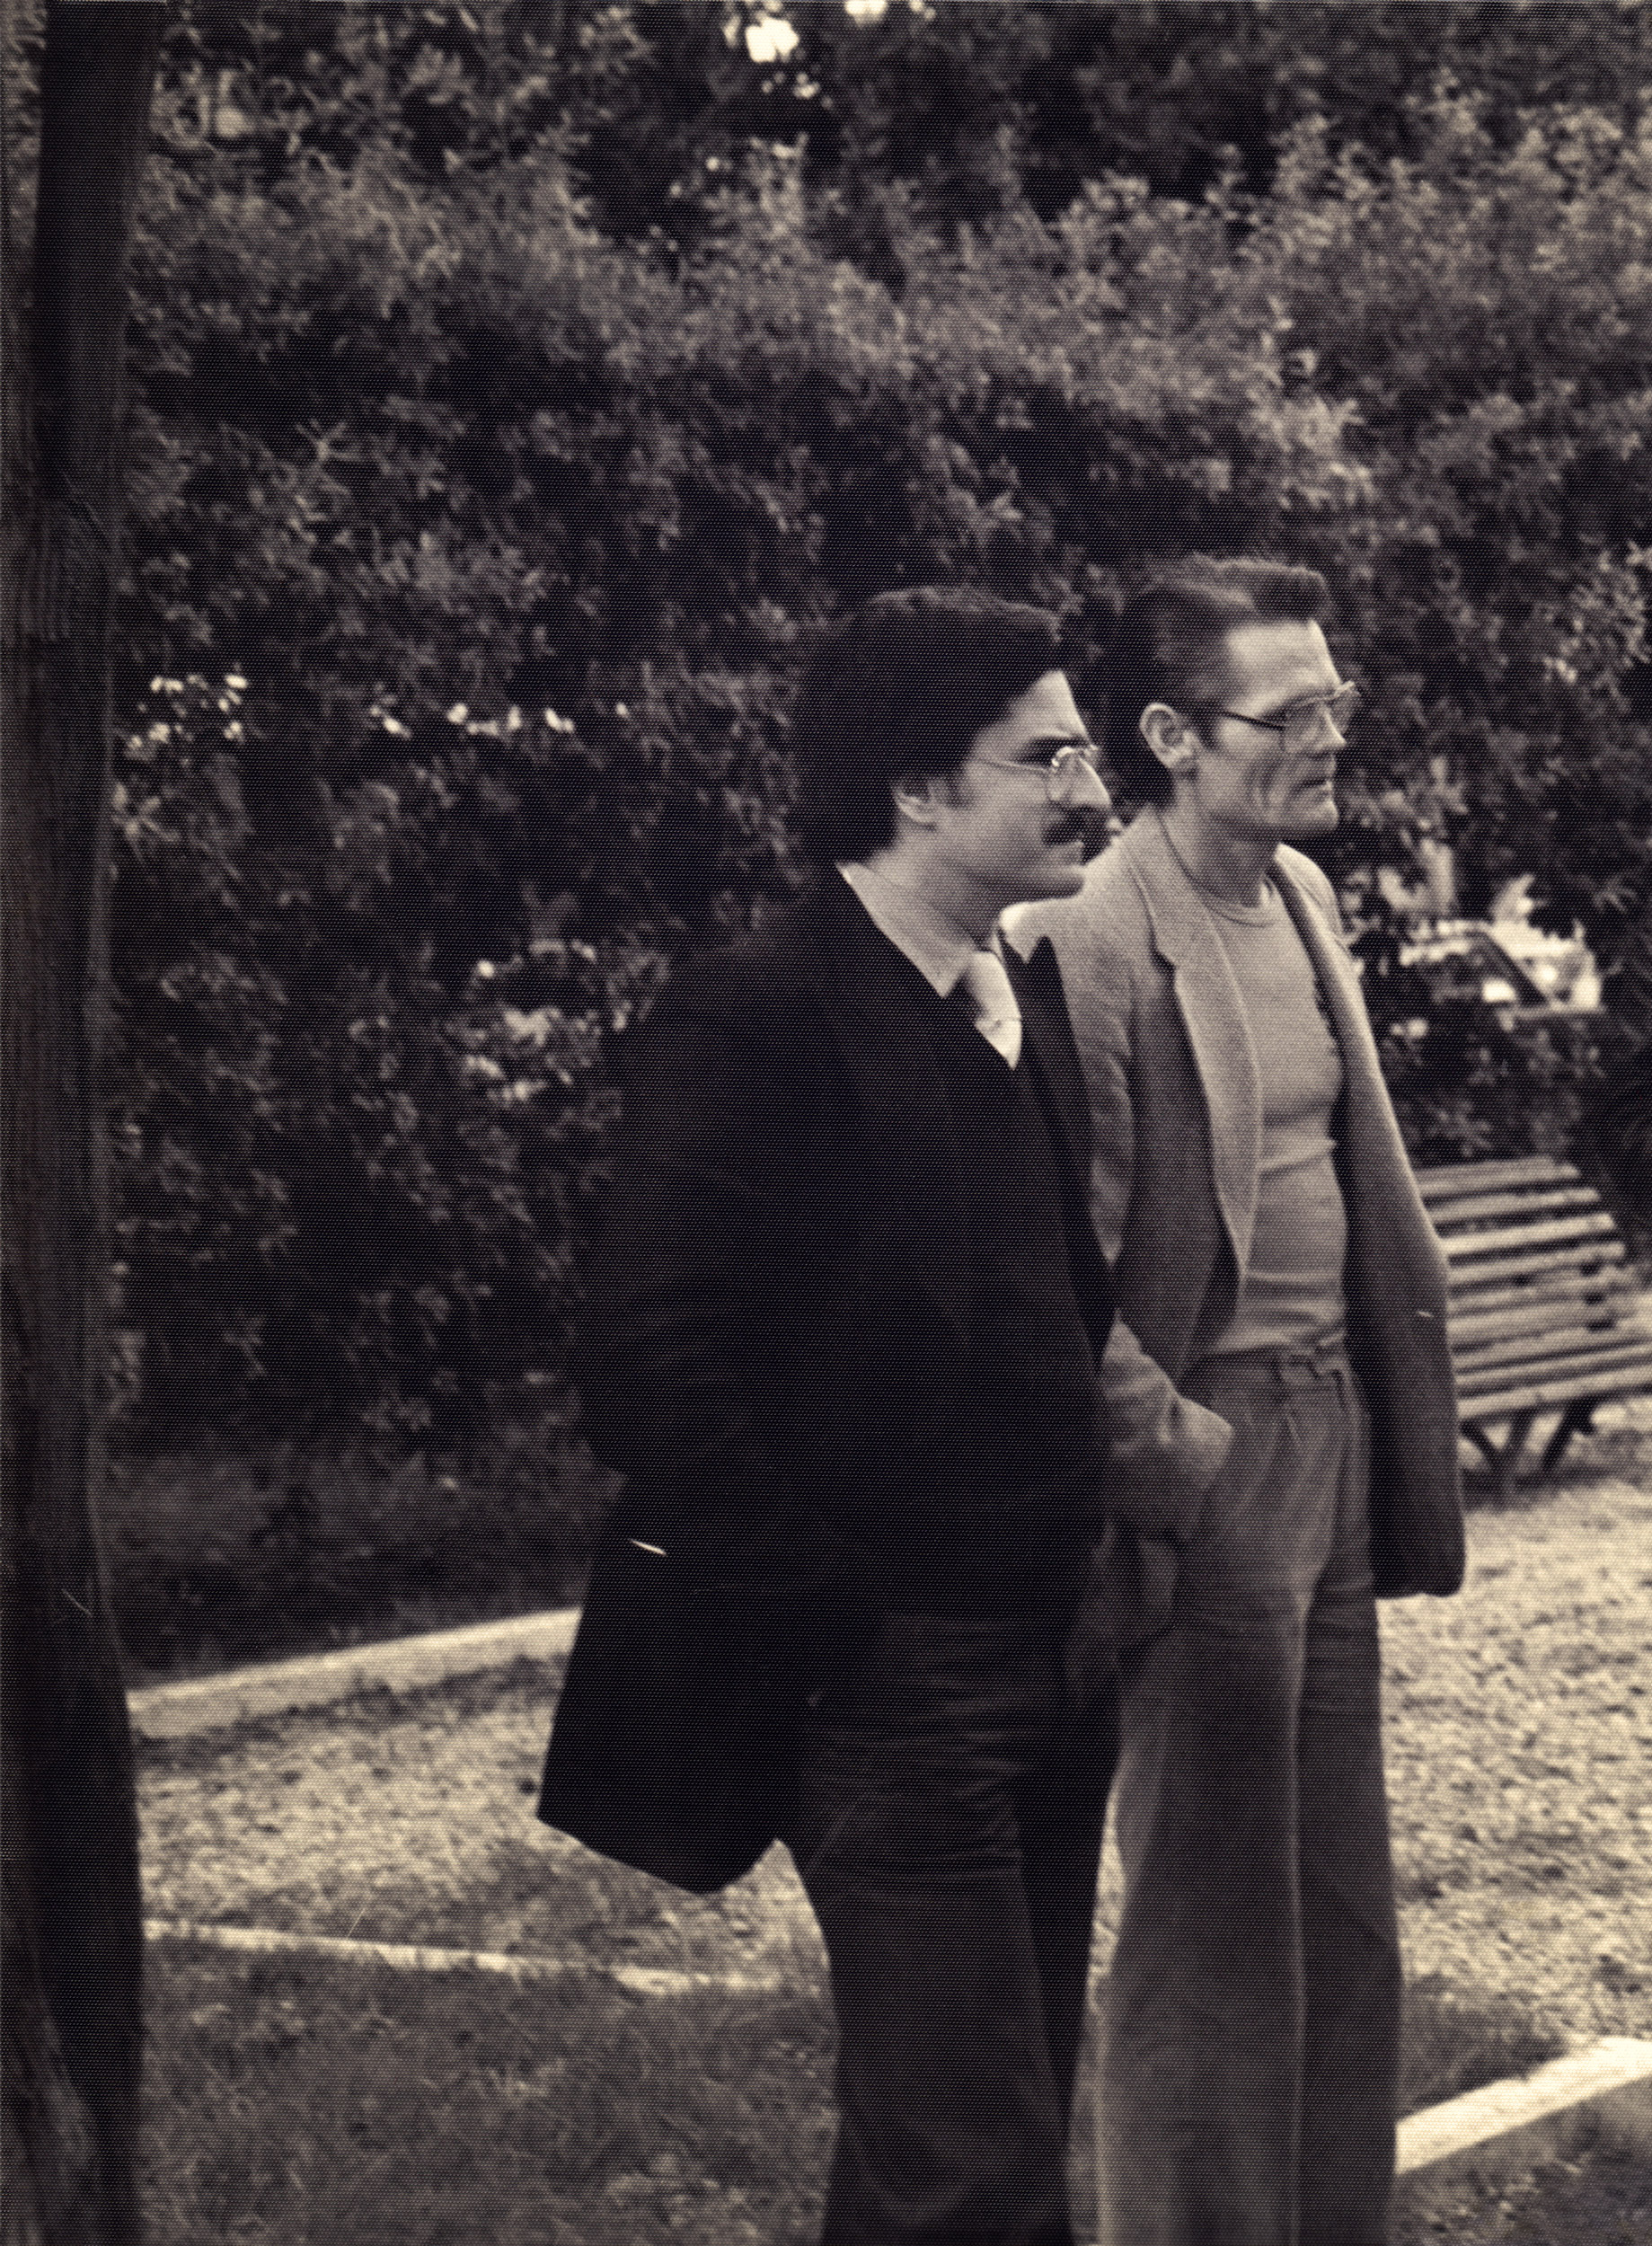 Enrico Pieranunzi & Chet Baker  Roma, 1979 Photo by Massimo Perelli